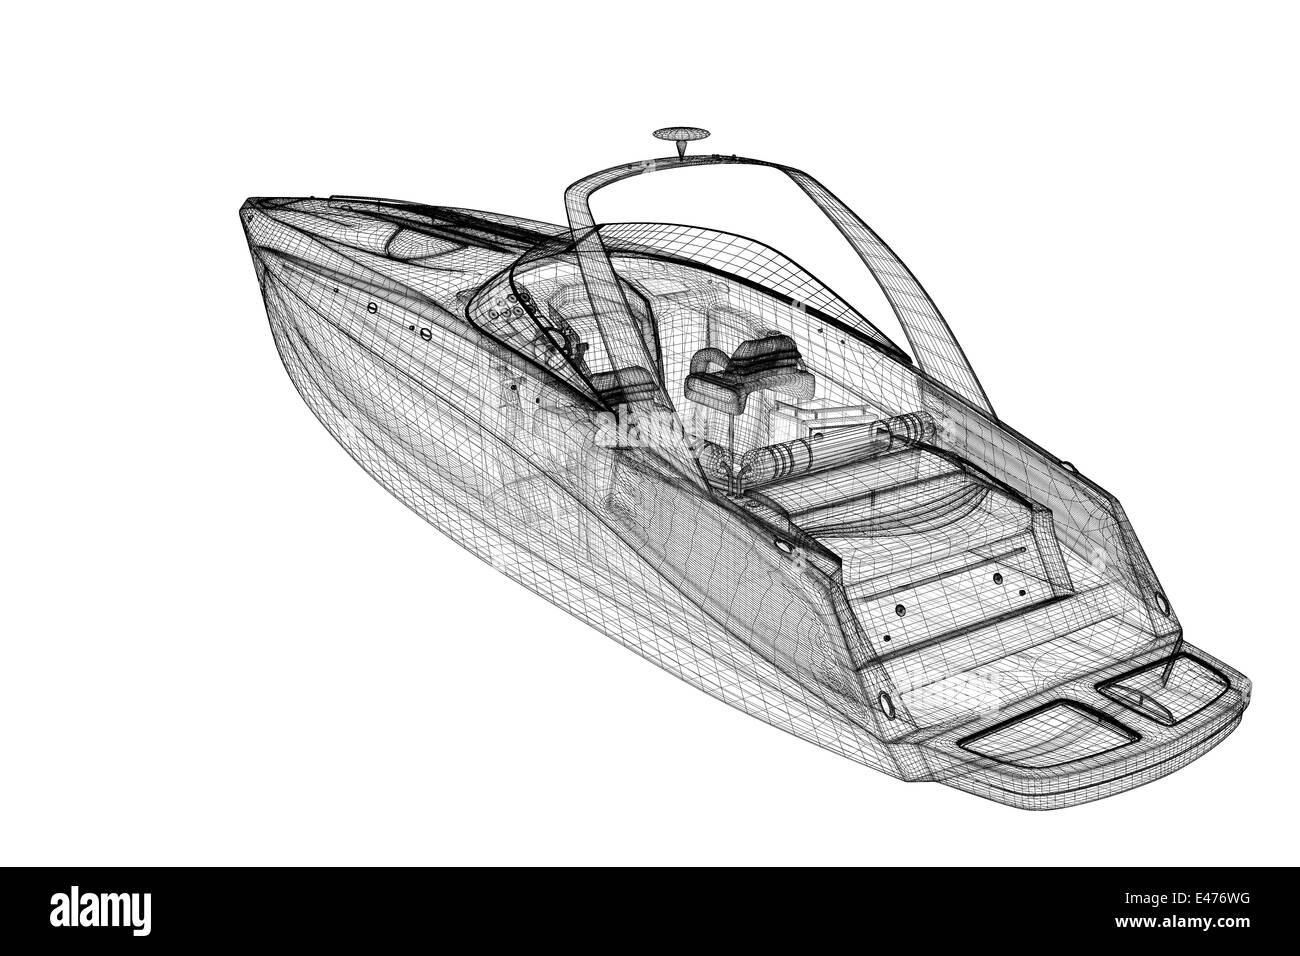 speedboat, Speeding Powerboat,3D model body structure, wire model